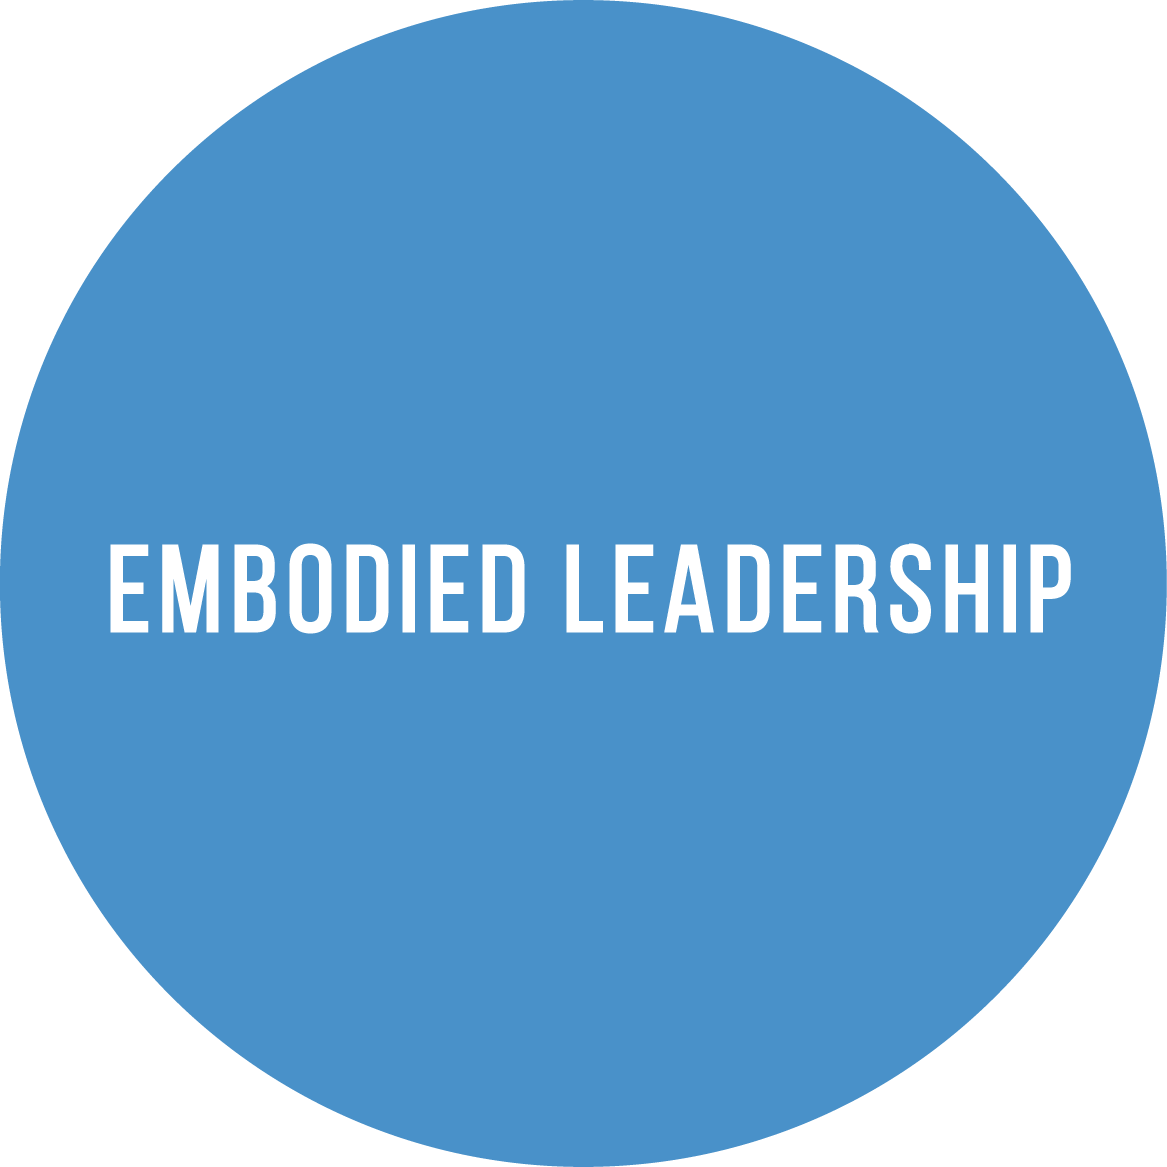 Embodied Leadership.png